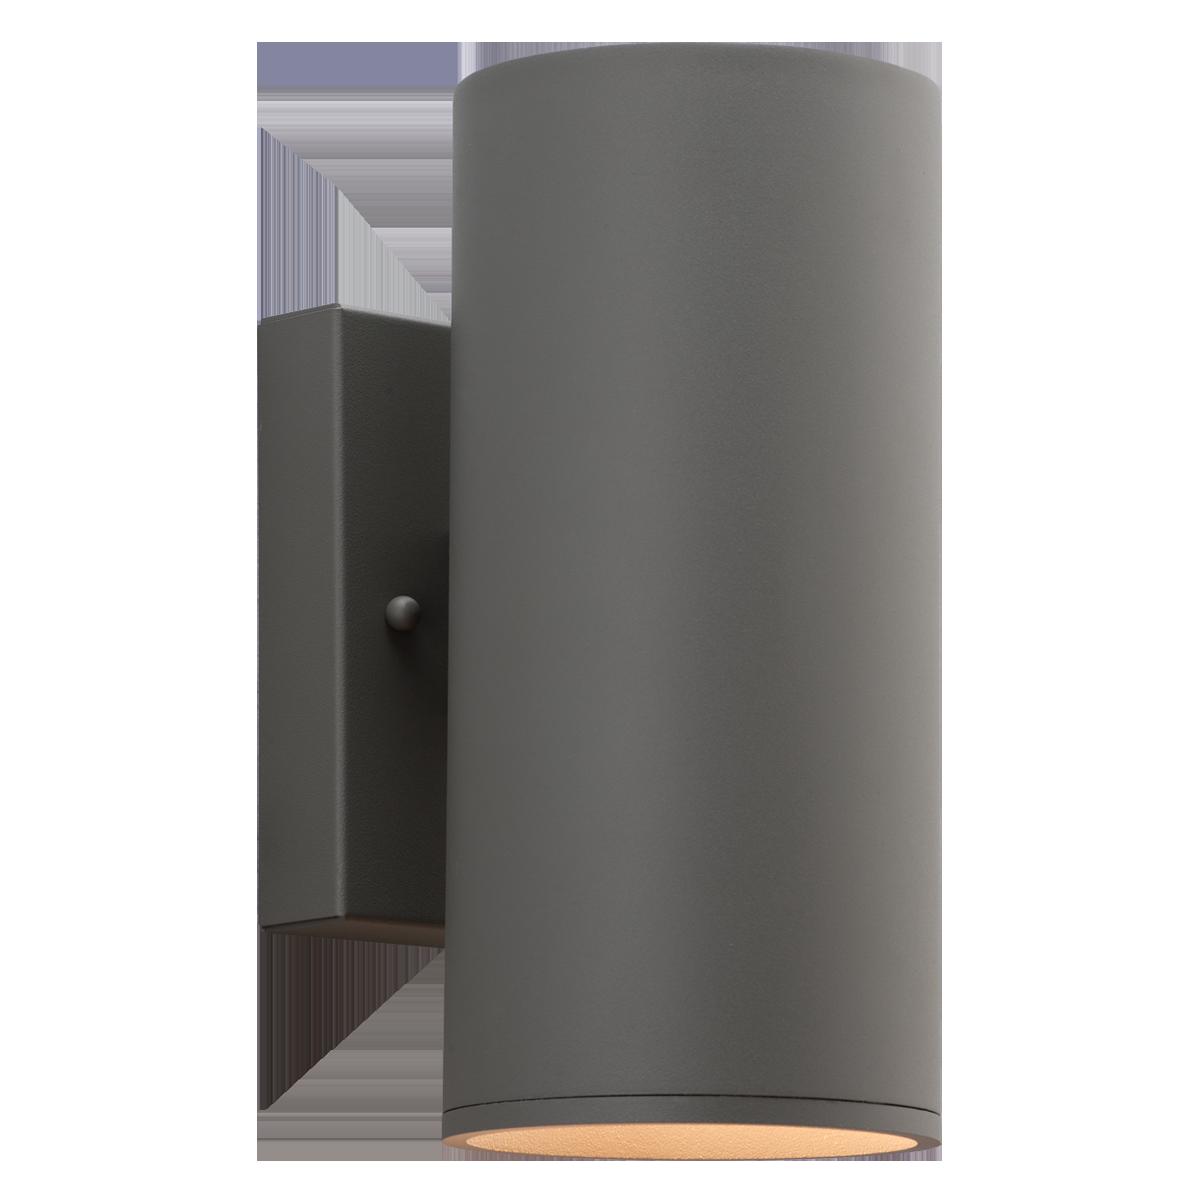 "5"" Round LED Wall Mount Downlight Cylinder, 3500K  -  90 CRI"